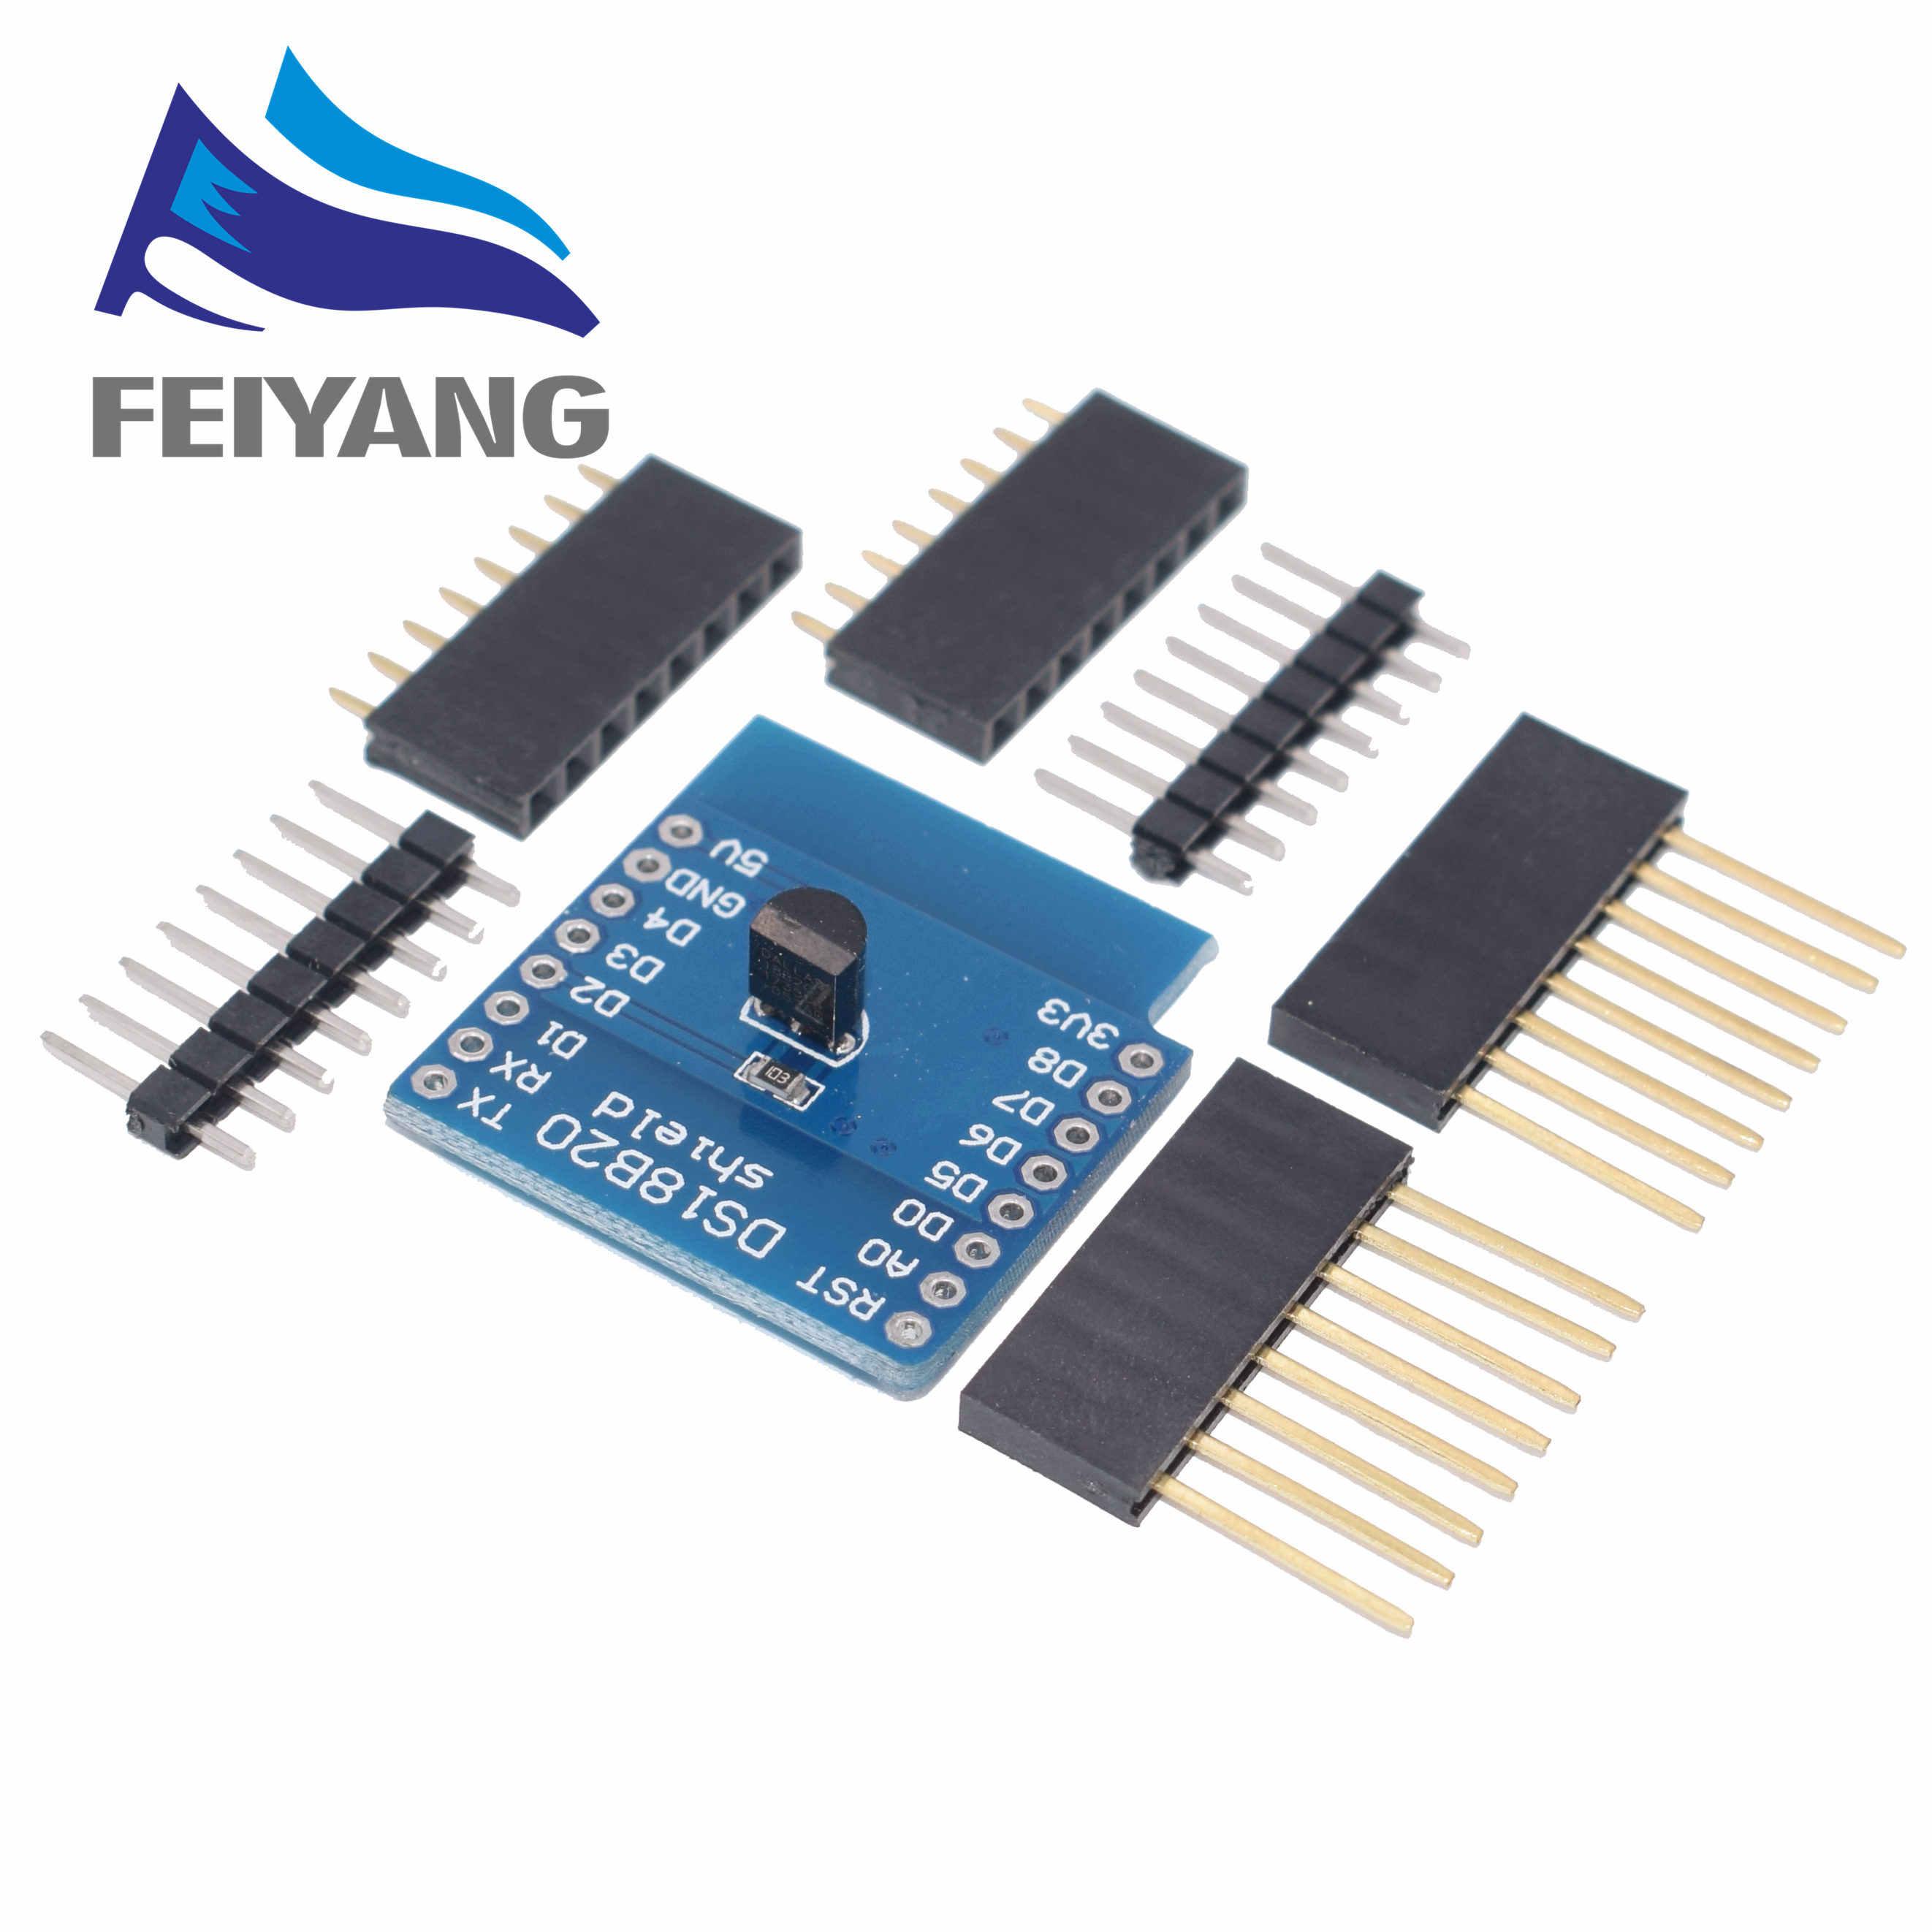 10PCS DS18B20 อุณหภูมิSensor Shield Wemos D1 Mini D1 Mini Pro ESP NodeMCU